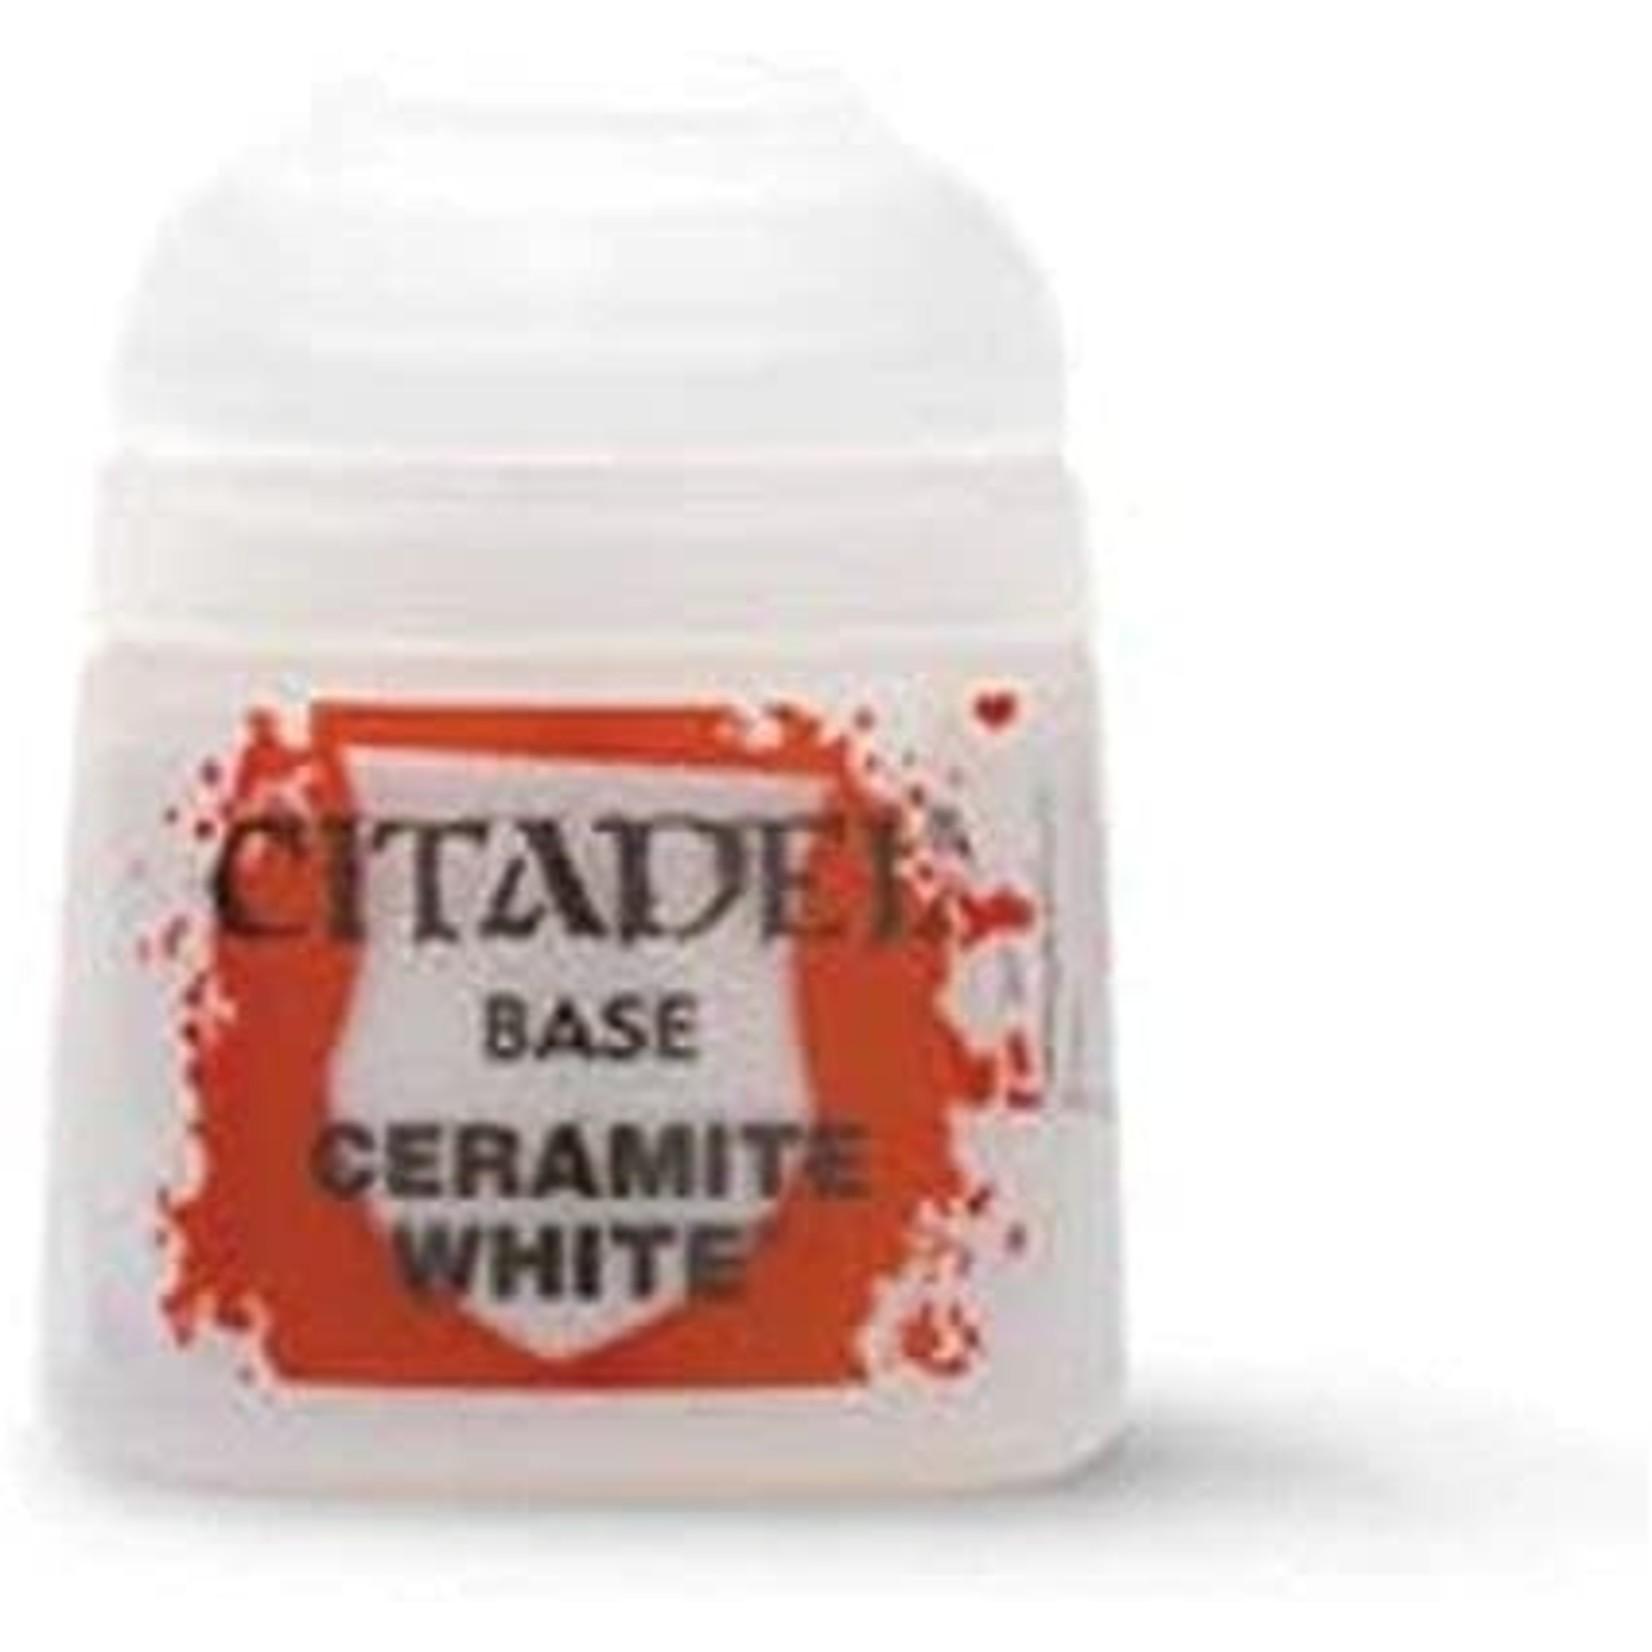 Games Workshop Citadel Paint: Ceramite White 12ml